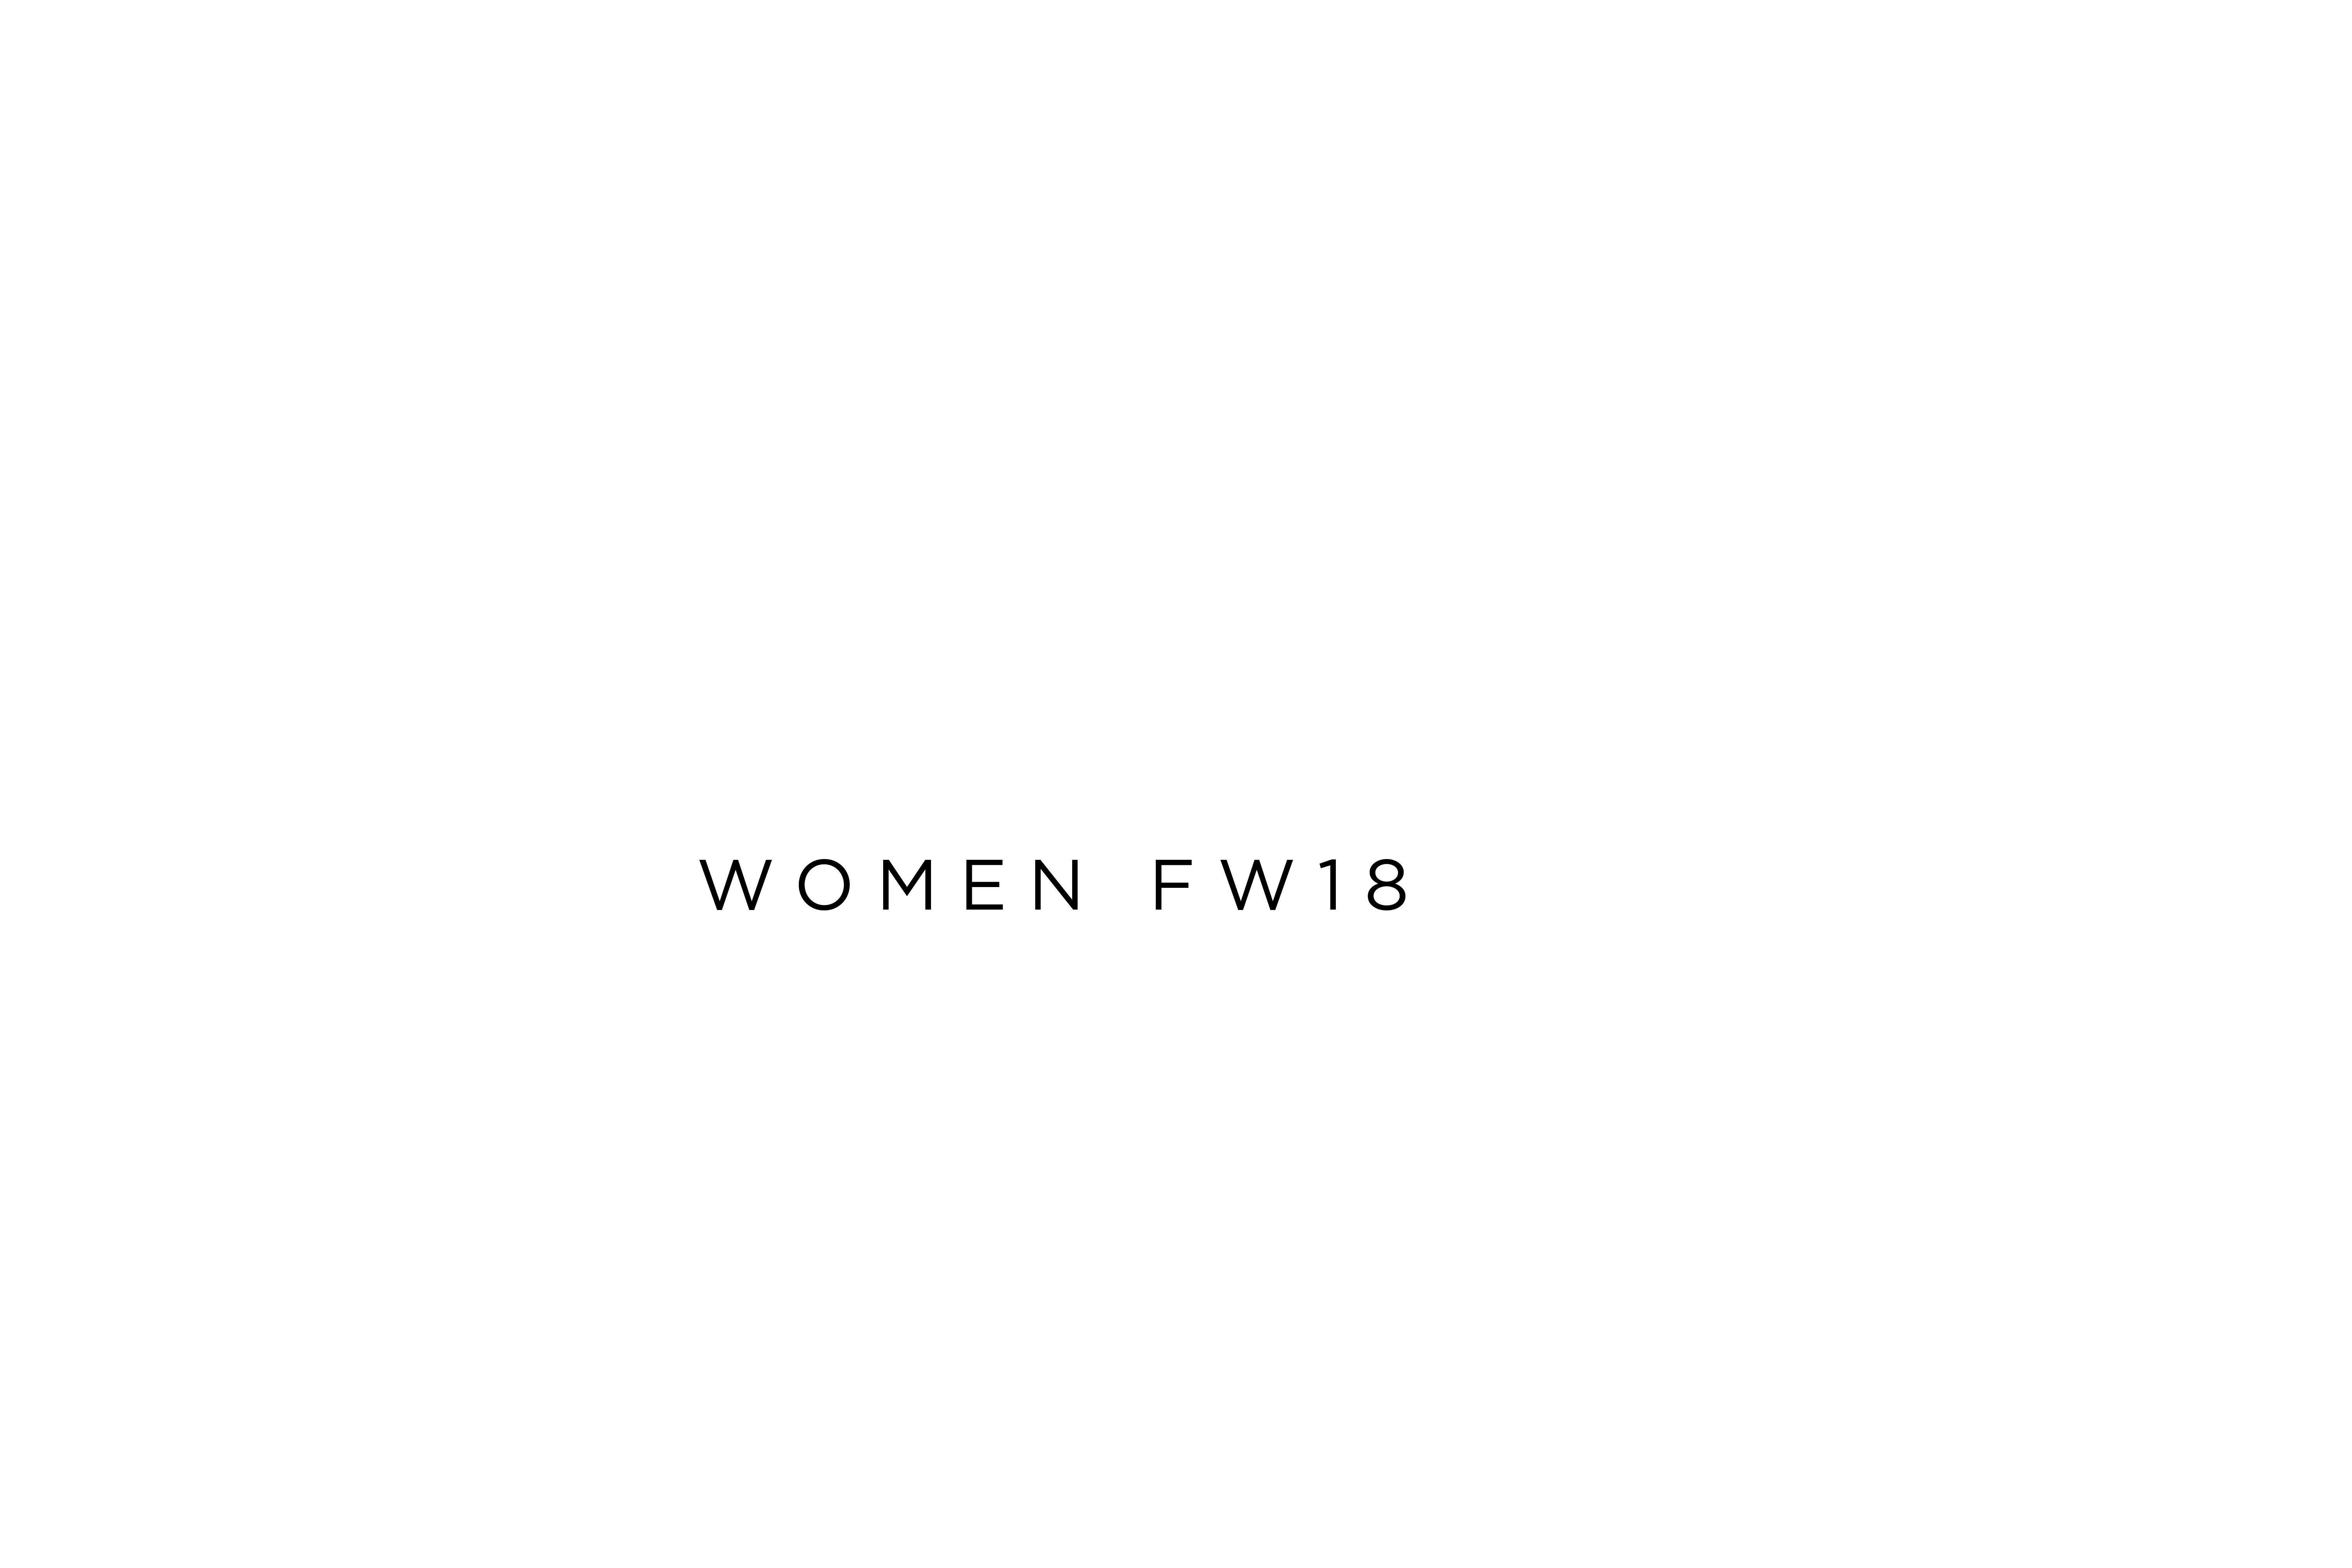 Women fw18